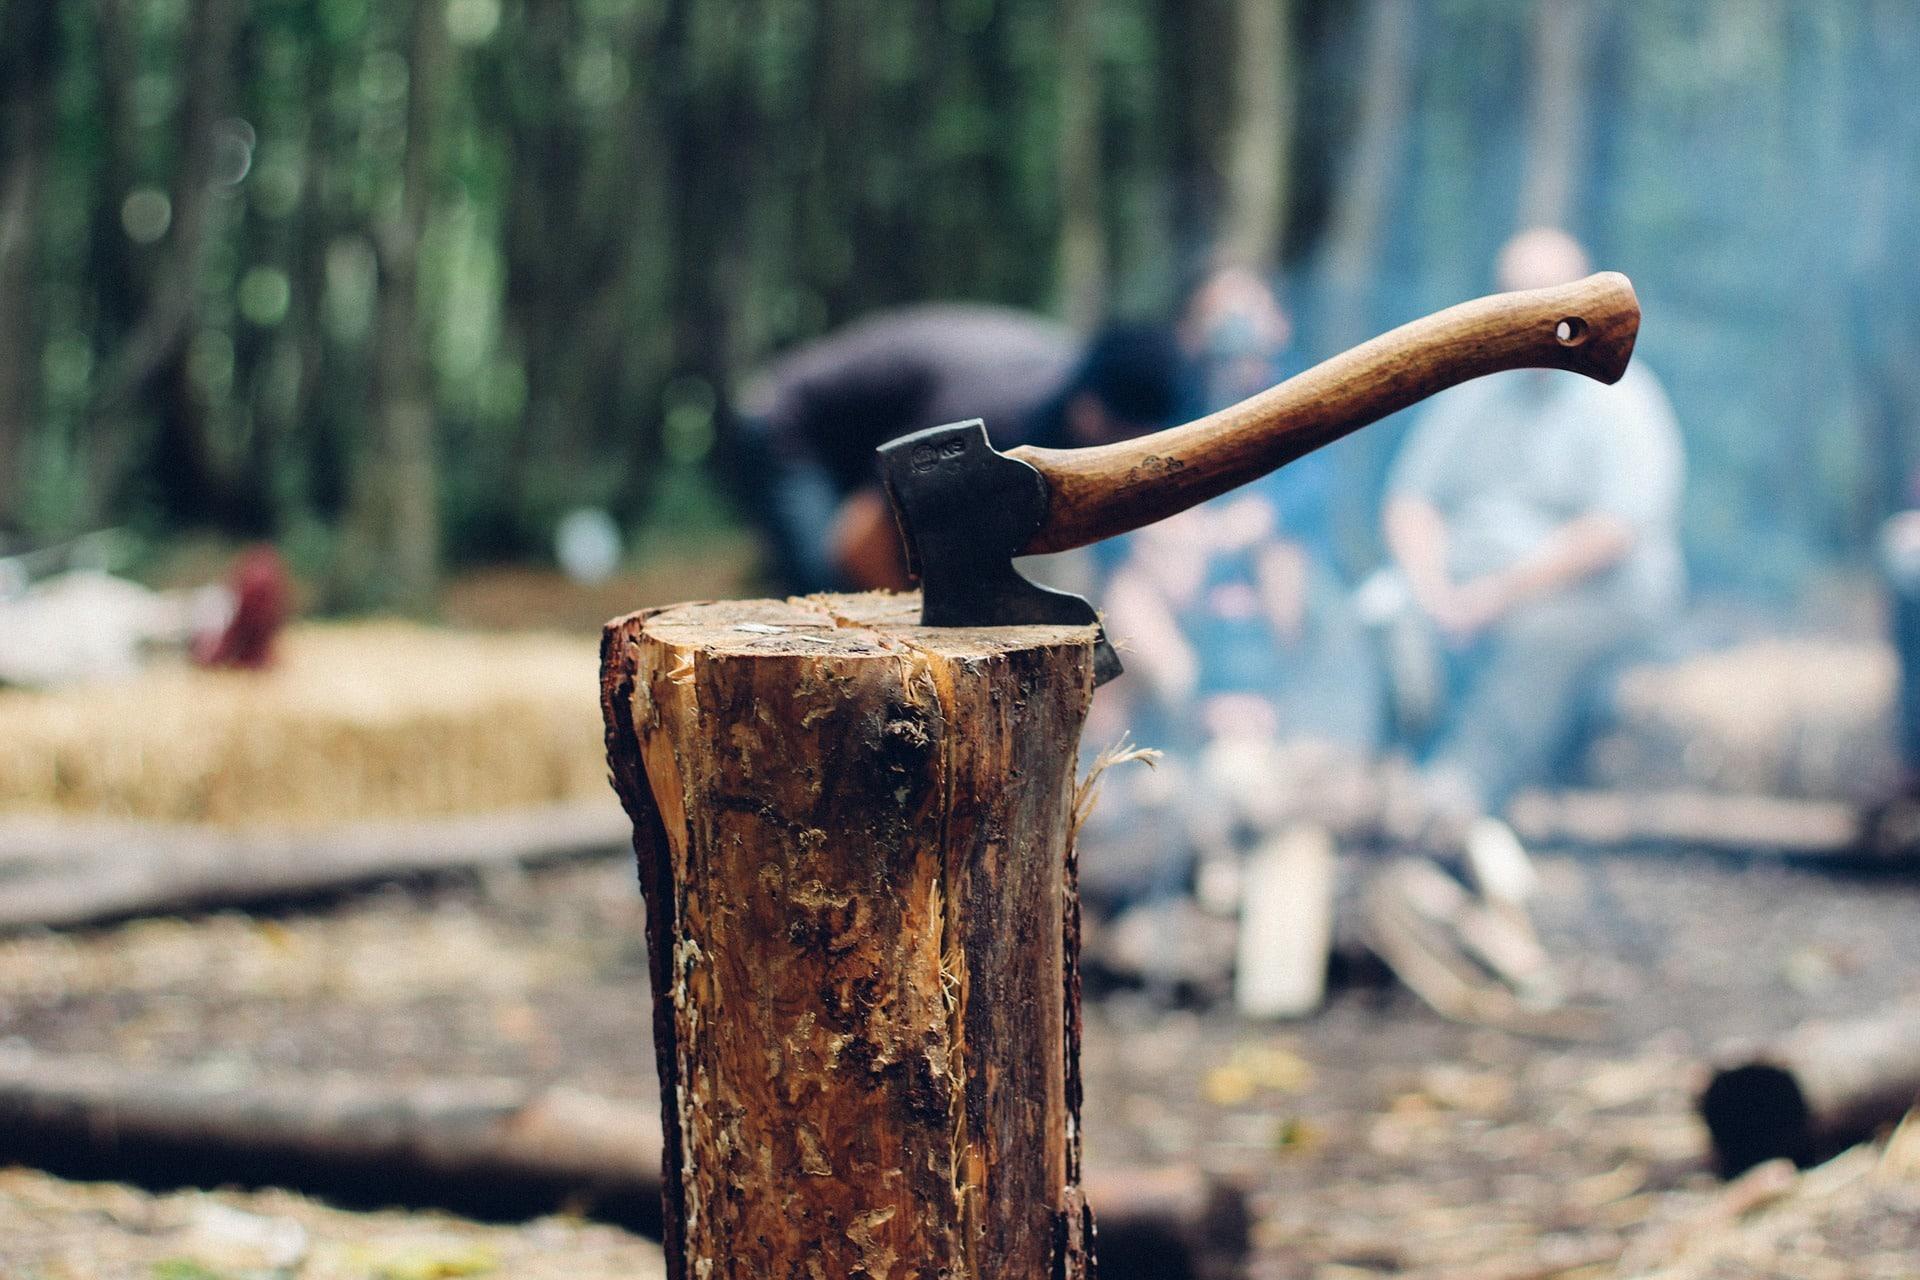 Husqvarna Camping Axe Review 2020